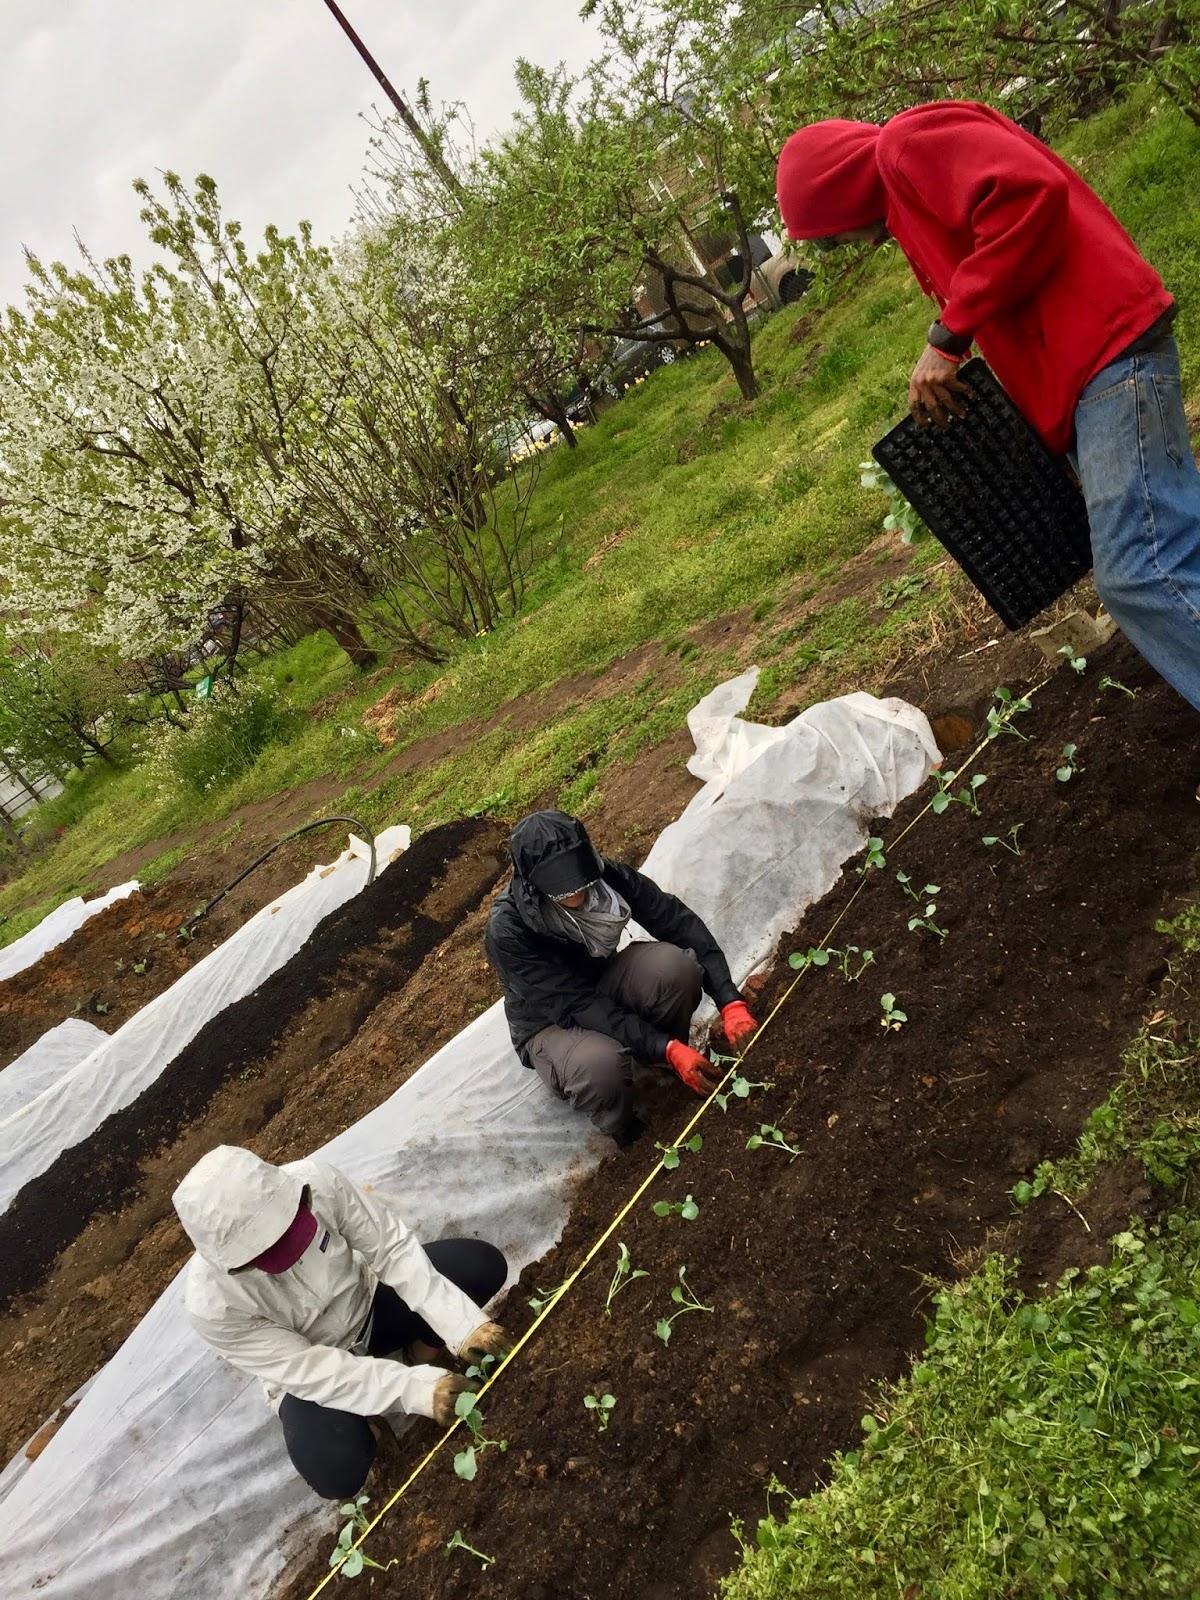 Planting broccoli